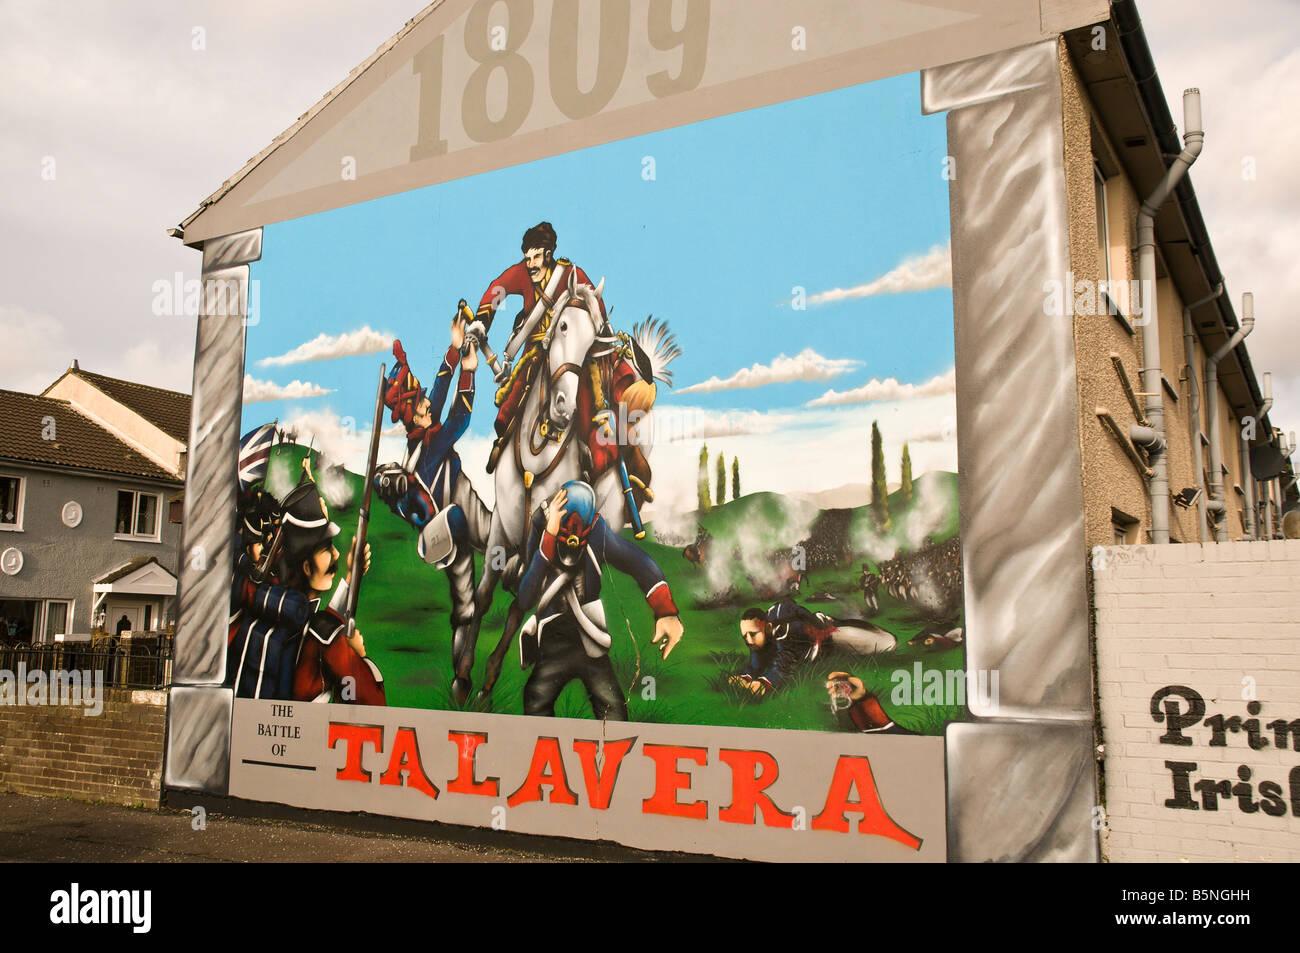 Loyalist/Unionist mural, '1809, The Battle of Talavera' - Stock Image